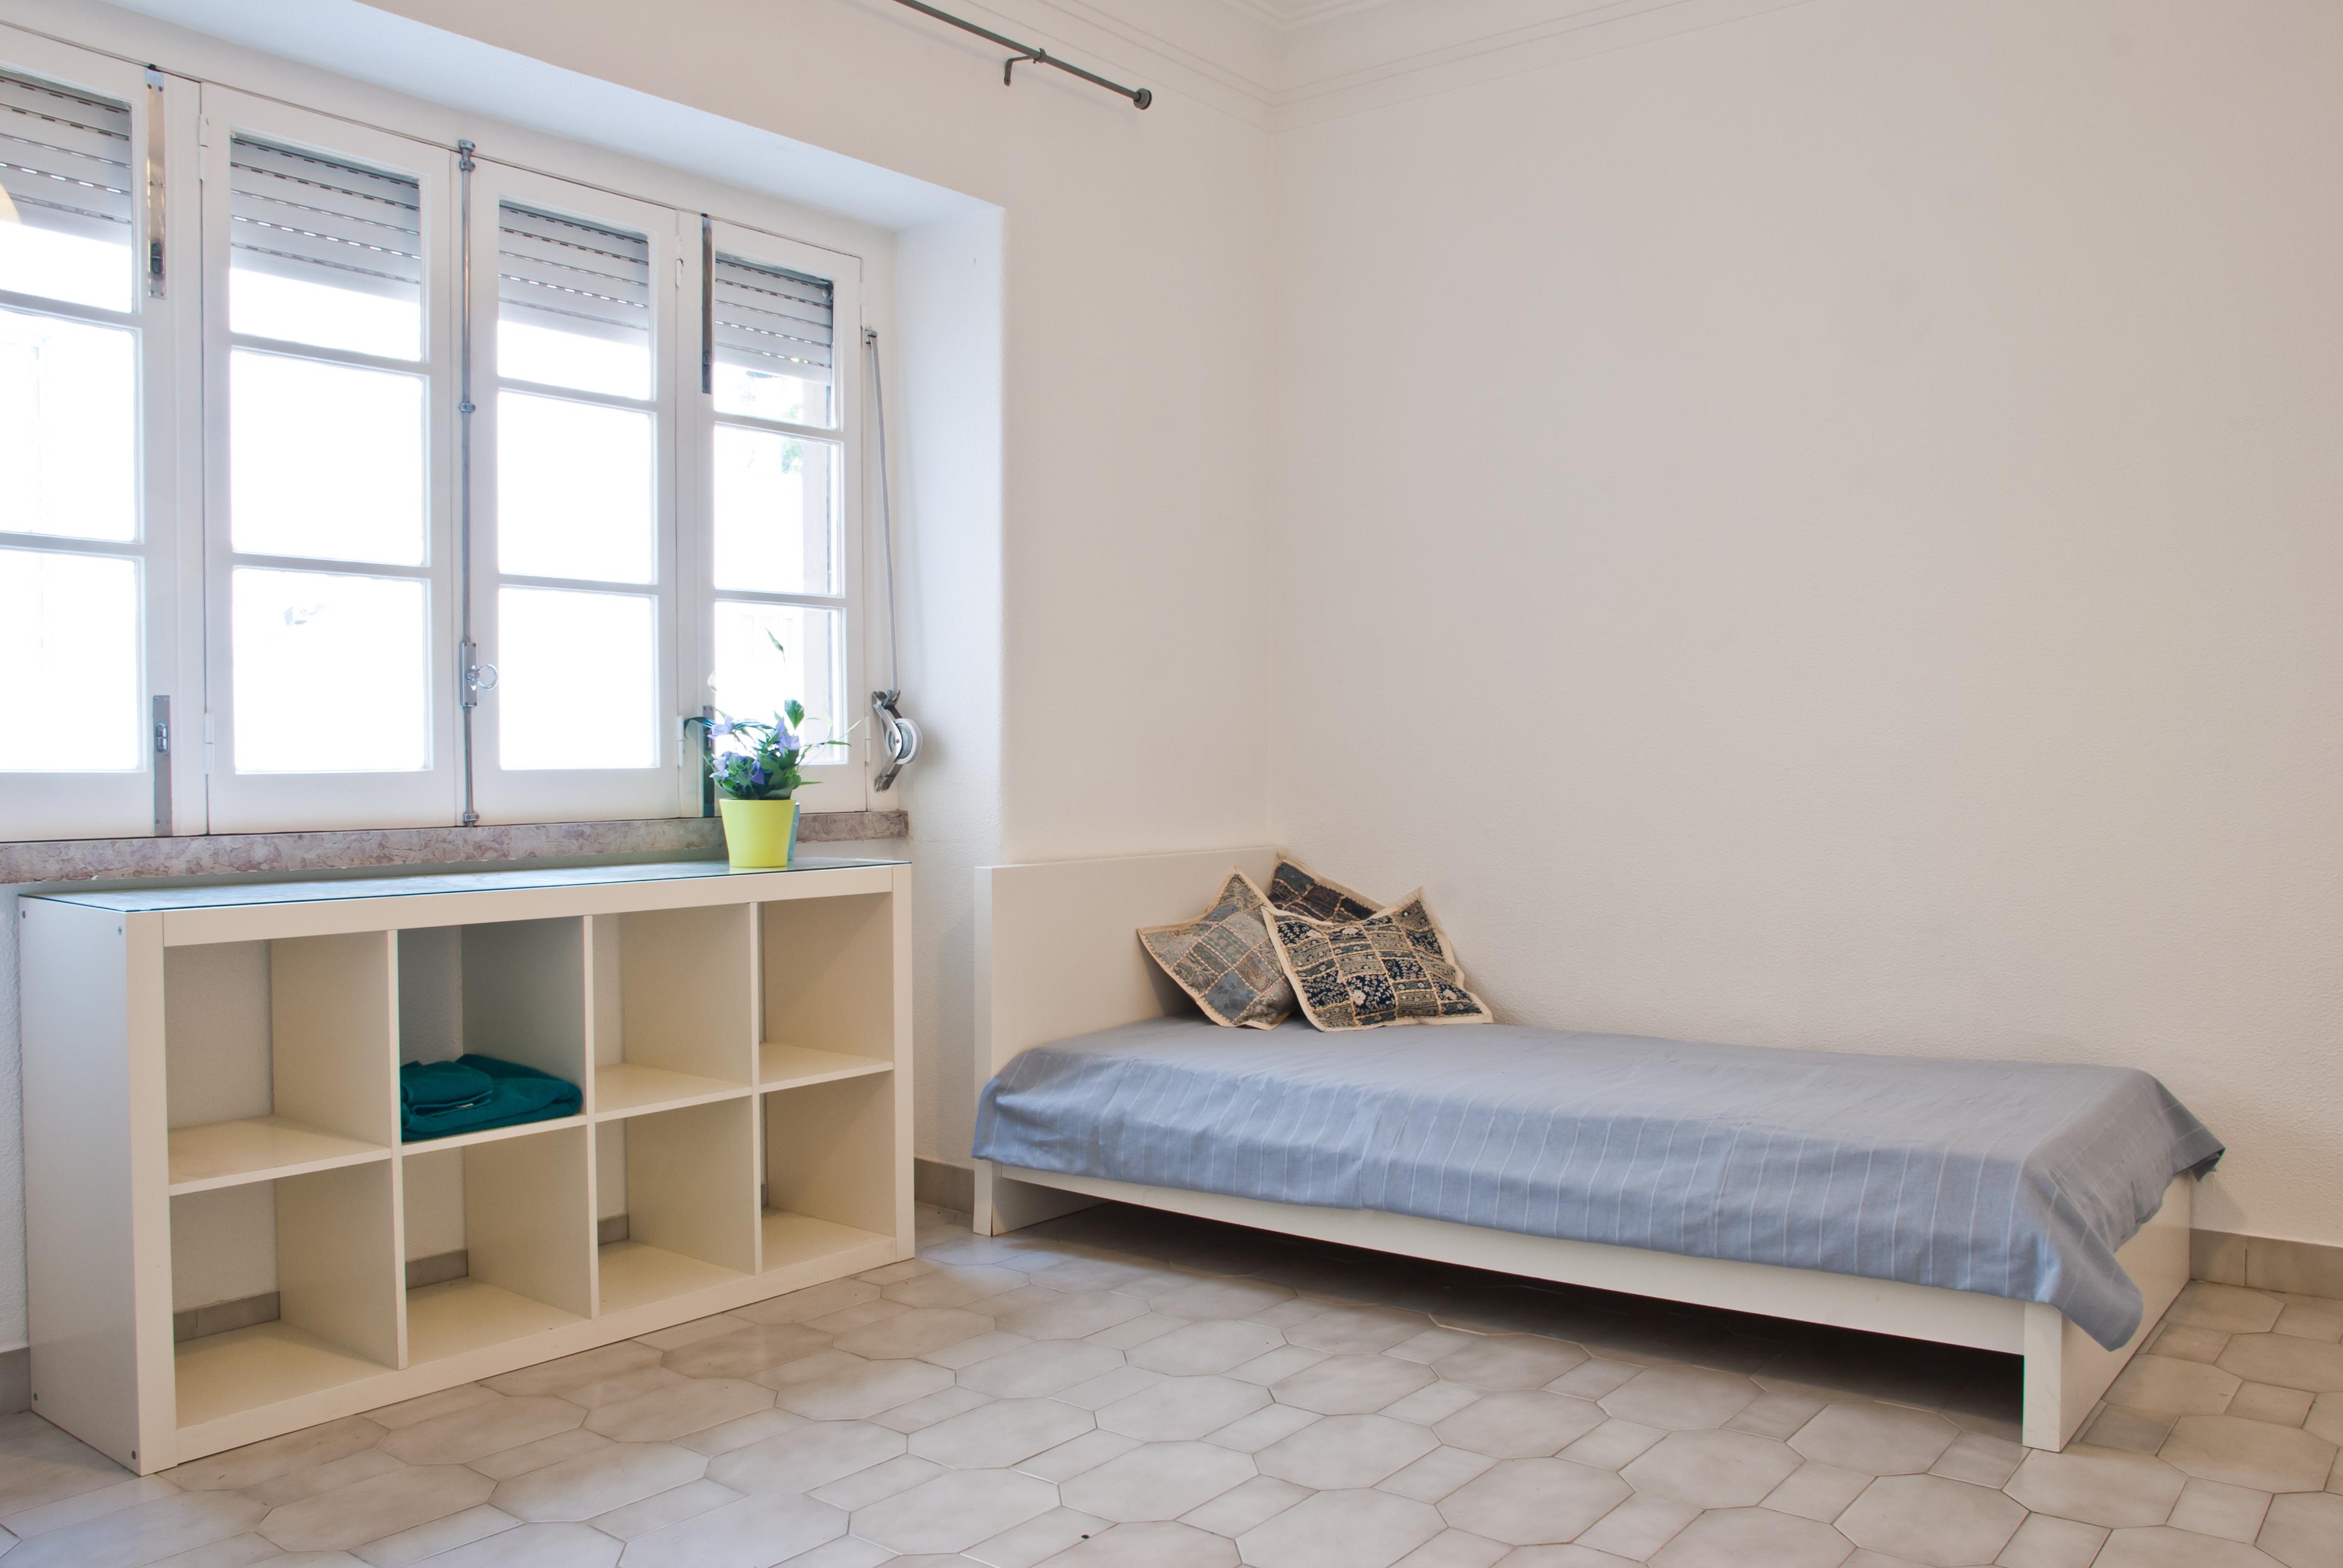 GJ_-_Quarto.Room_nº5_-_Foto_3.jpg